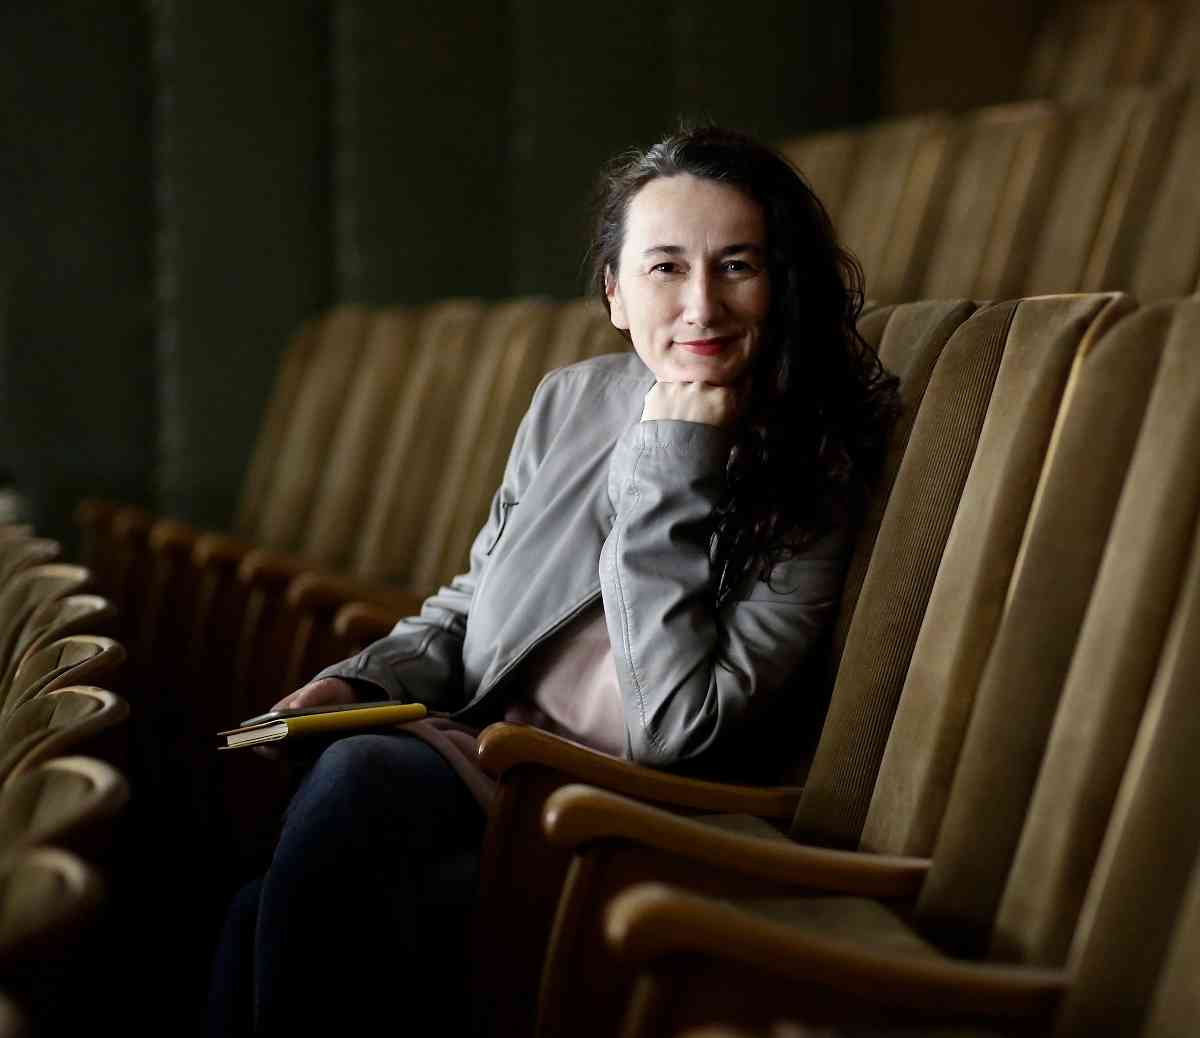 Wuppertaler Tanztheater: Streit Um Kündigung Geht In